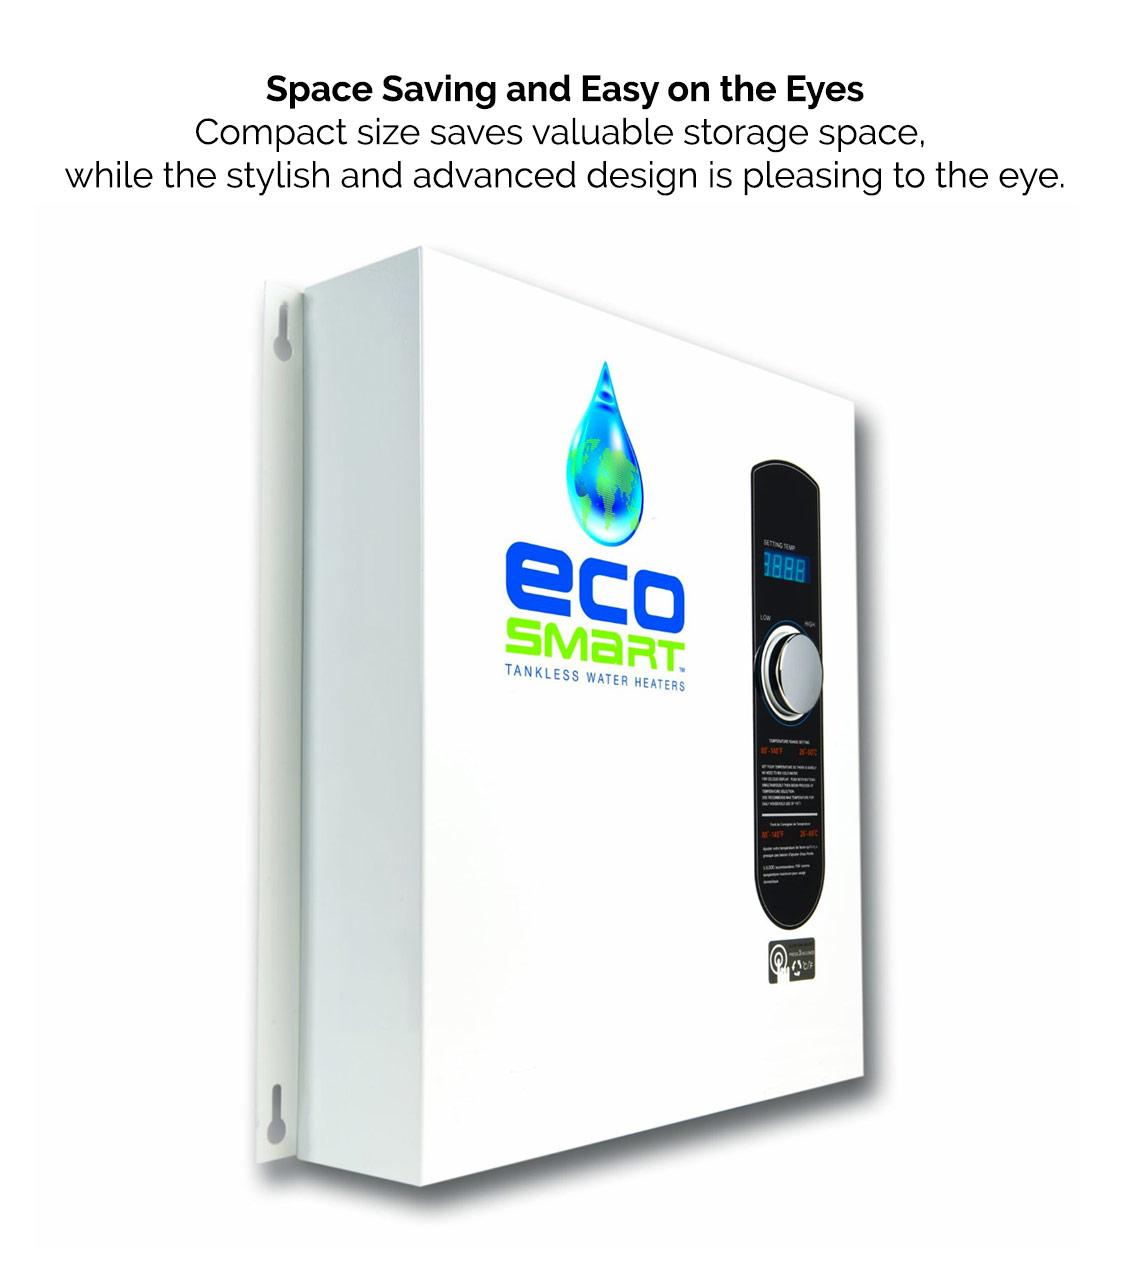 Ecosmart Tankless Water Heater Space Saving Design